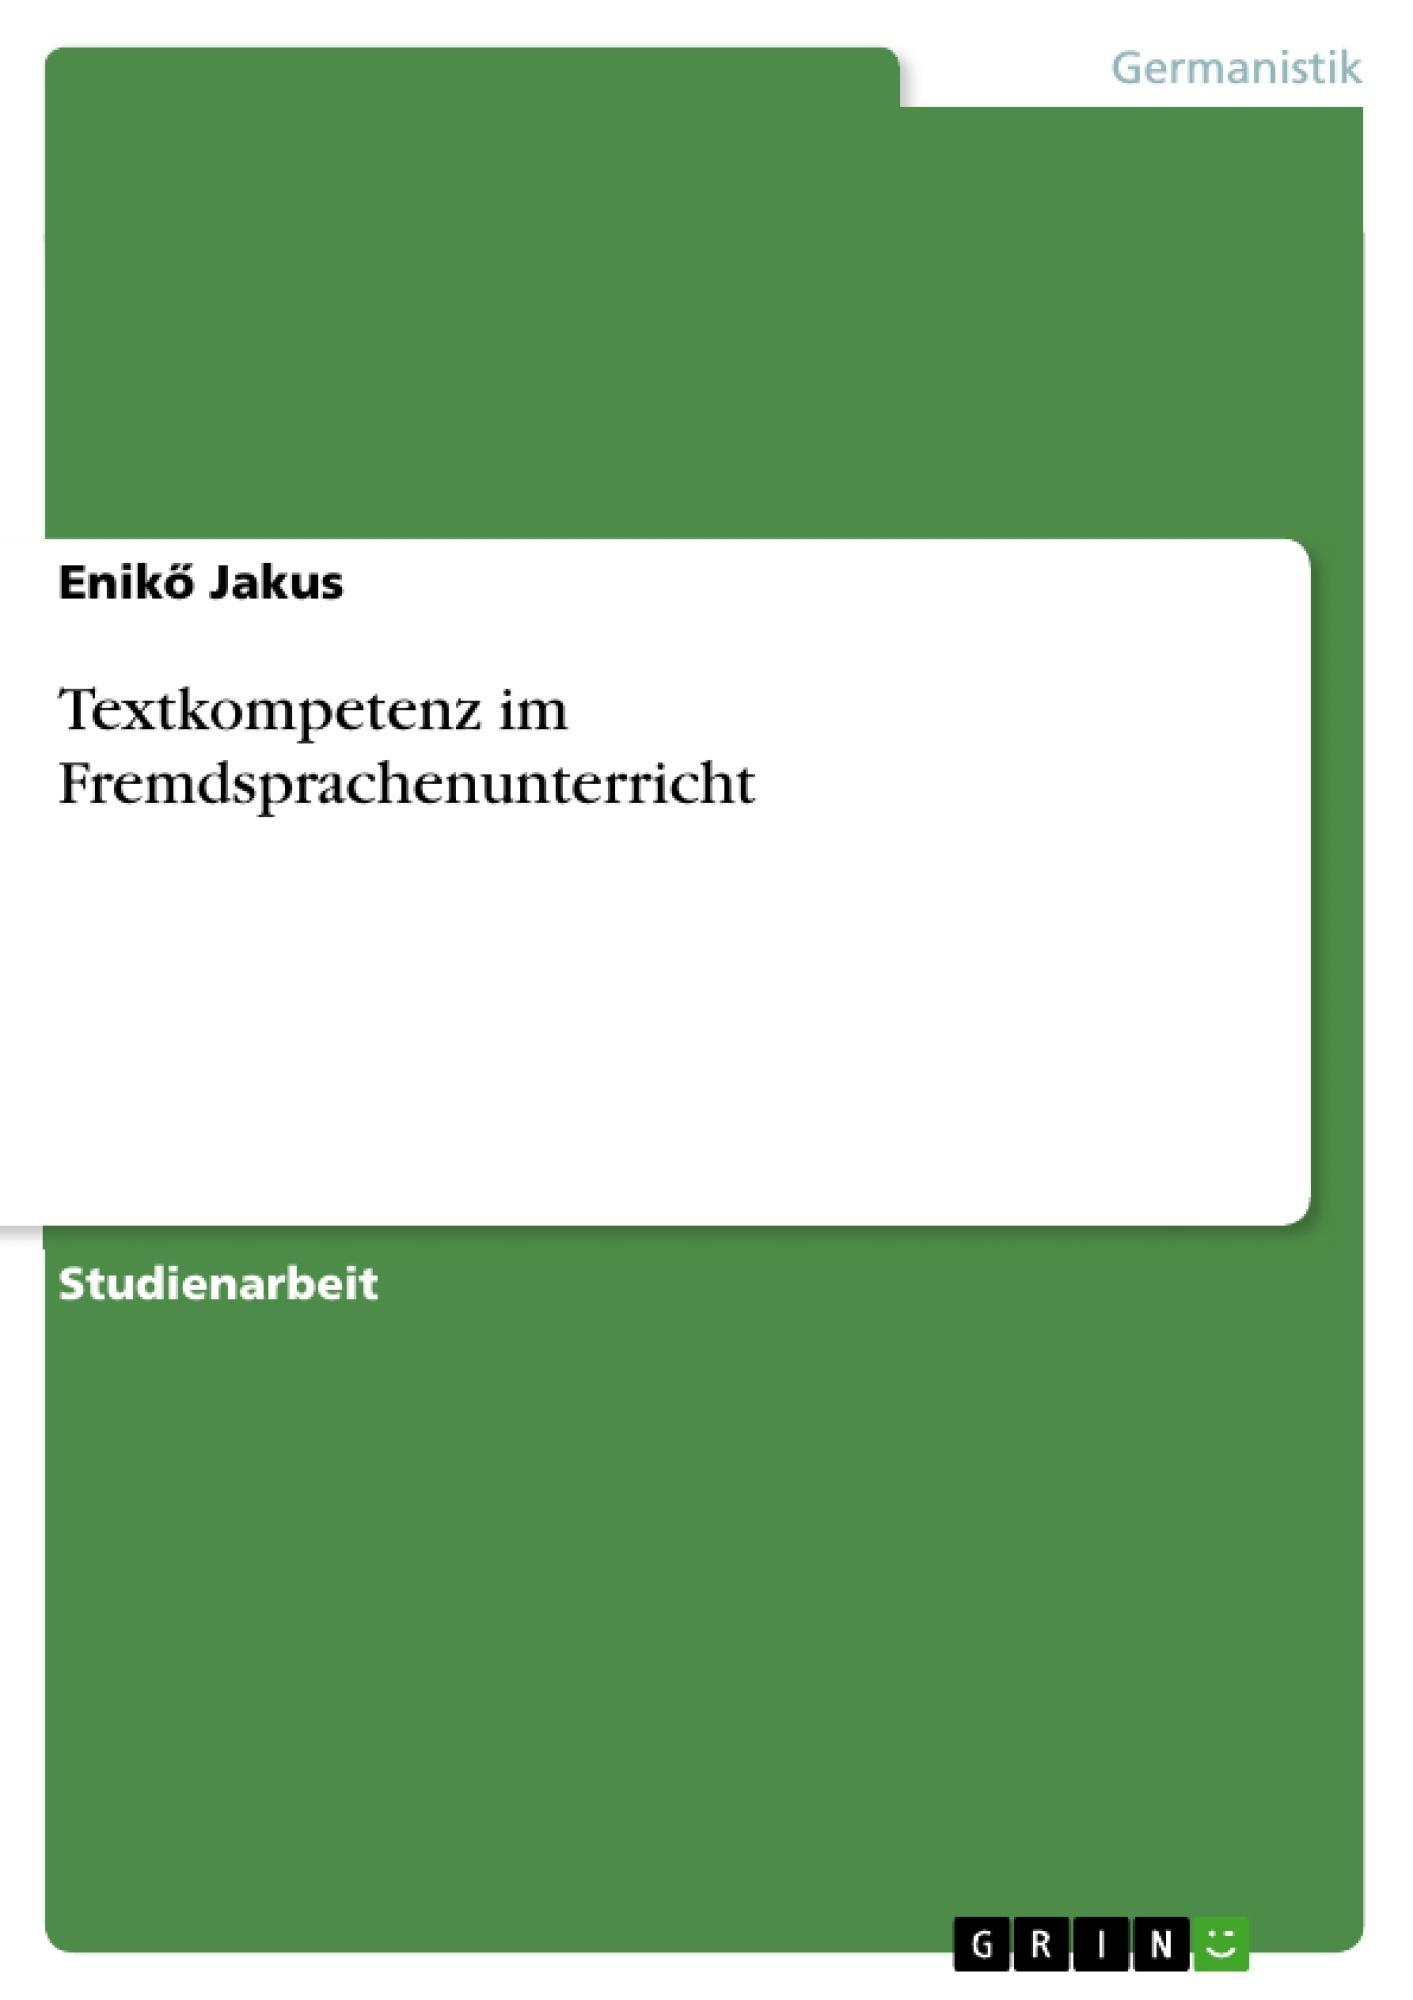 Titel: Textkompetenz im Fremdsprachenunterricht